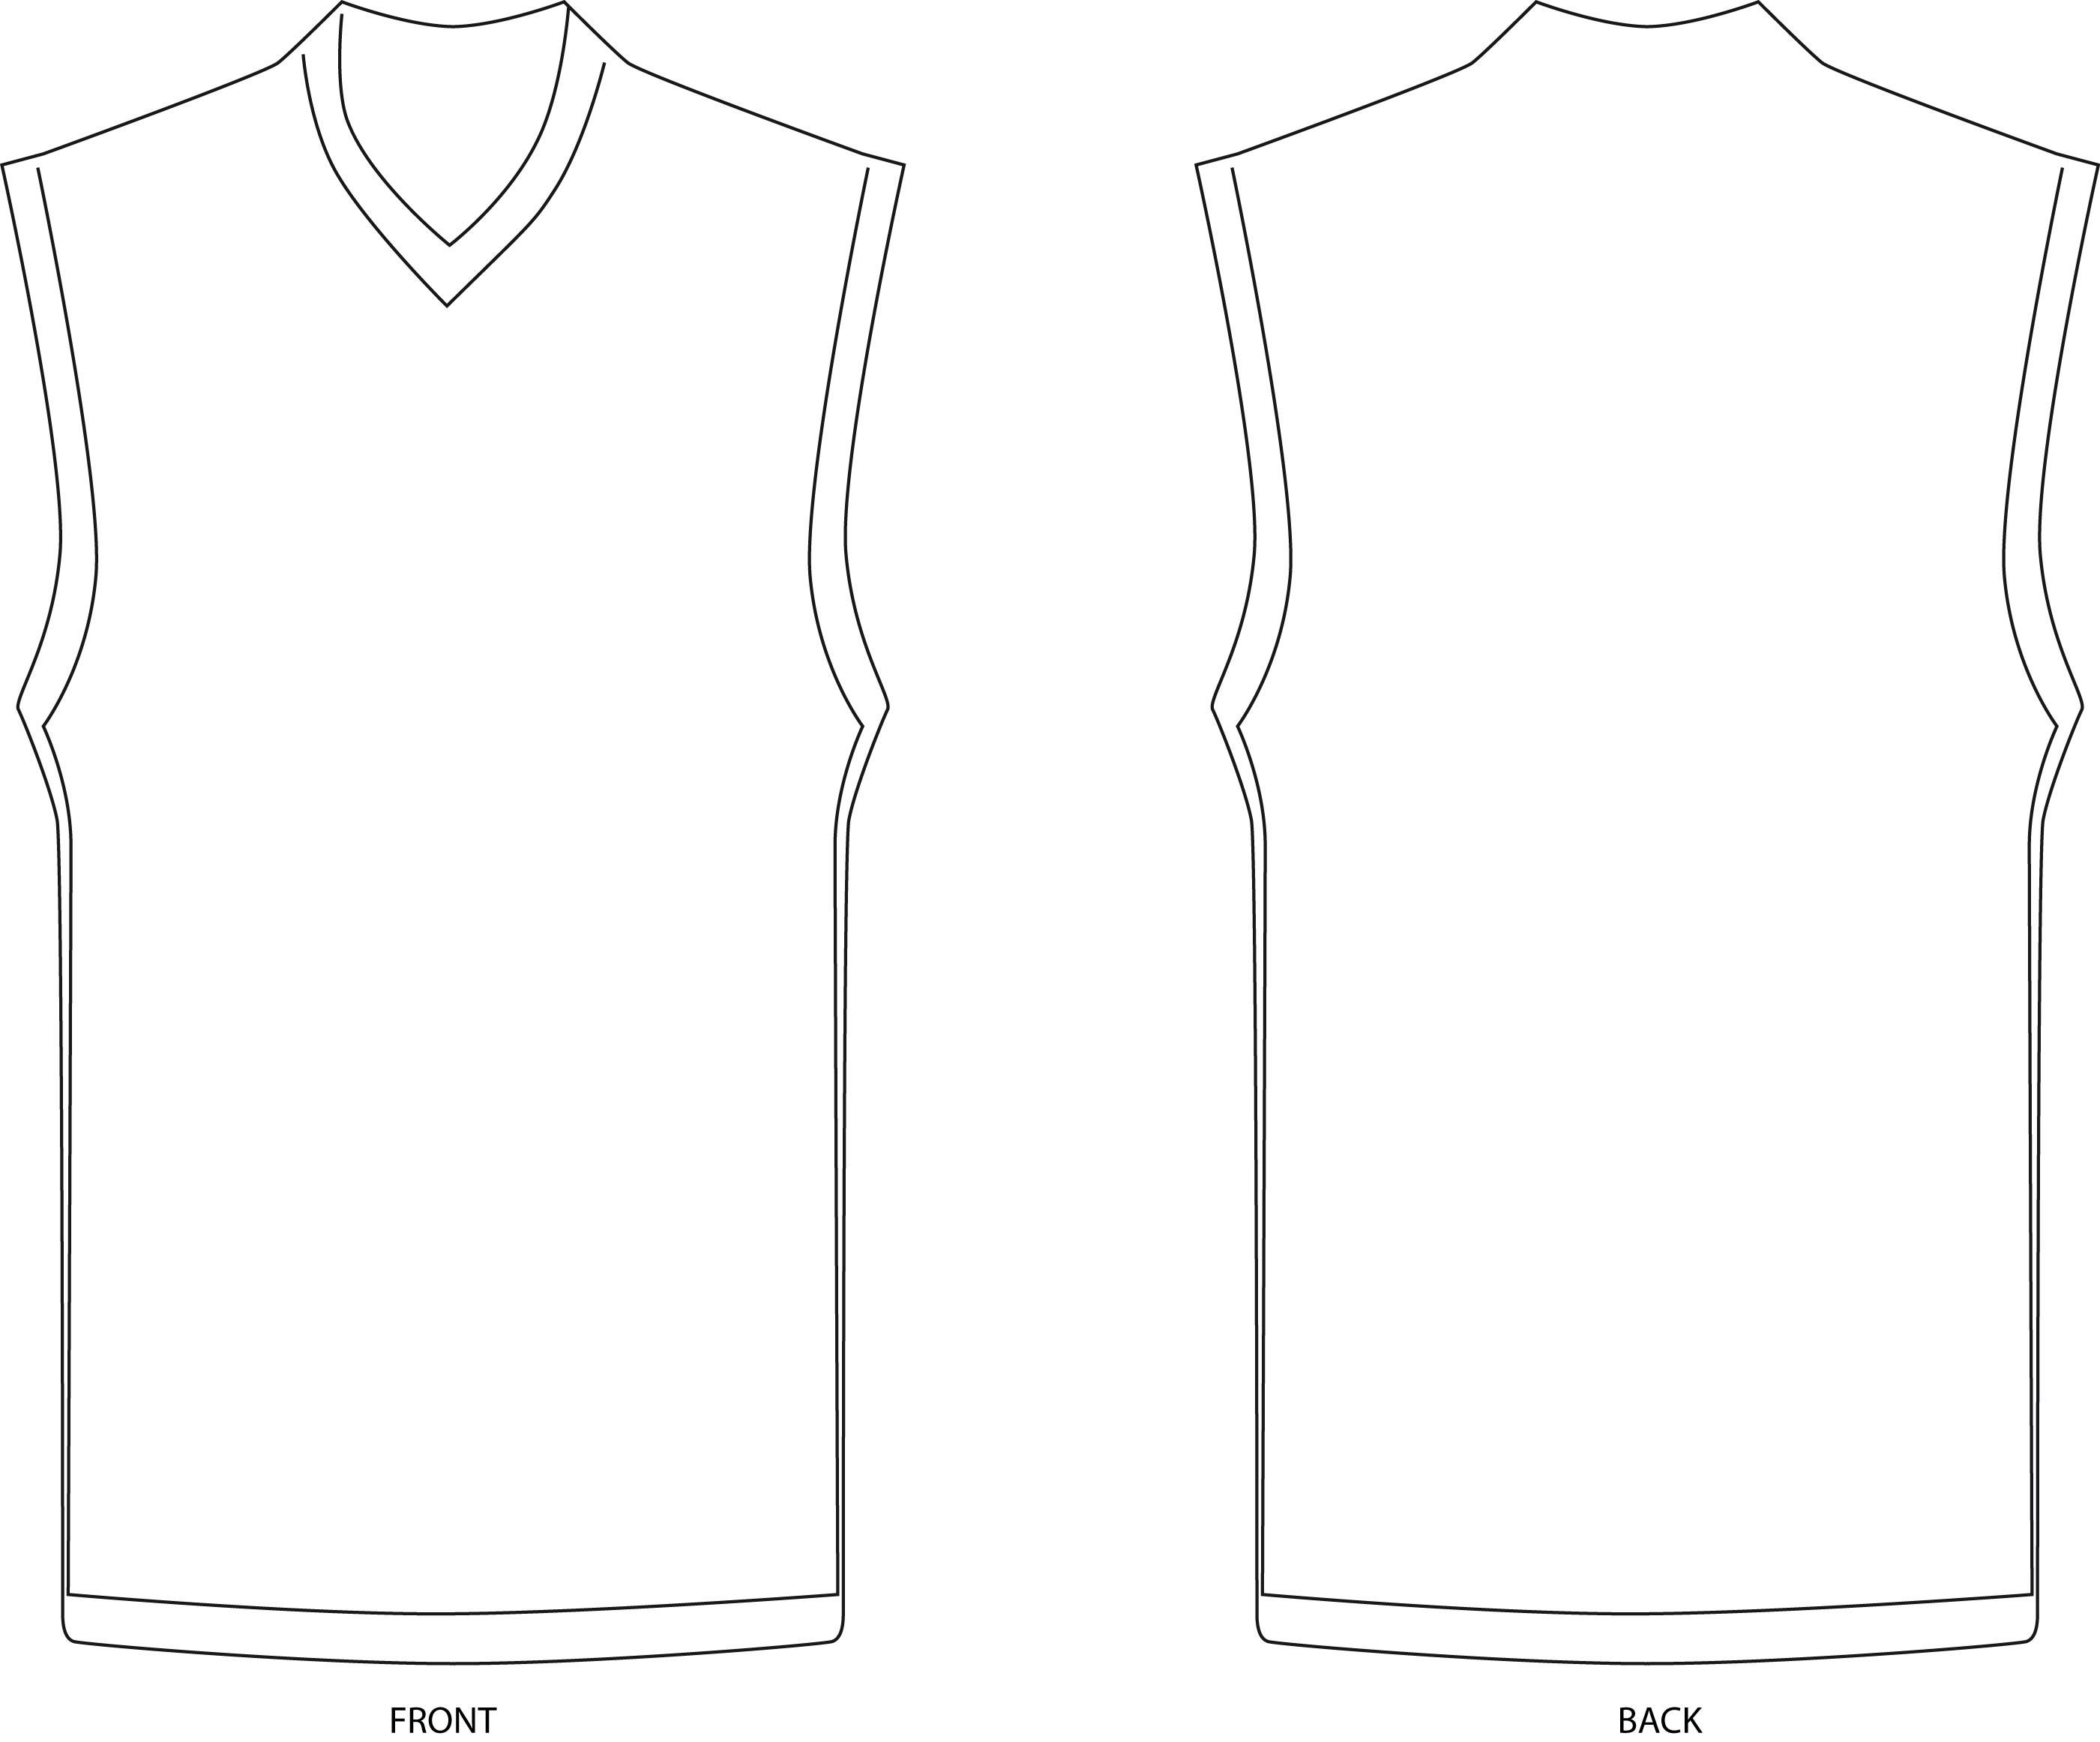 13 blank baseball jersey vector images baseball jersey template blank baseball jersey. Black Bedroom Furniture Sets. Home Design Ideas